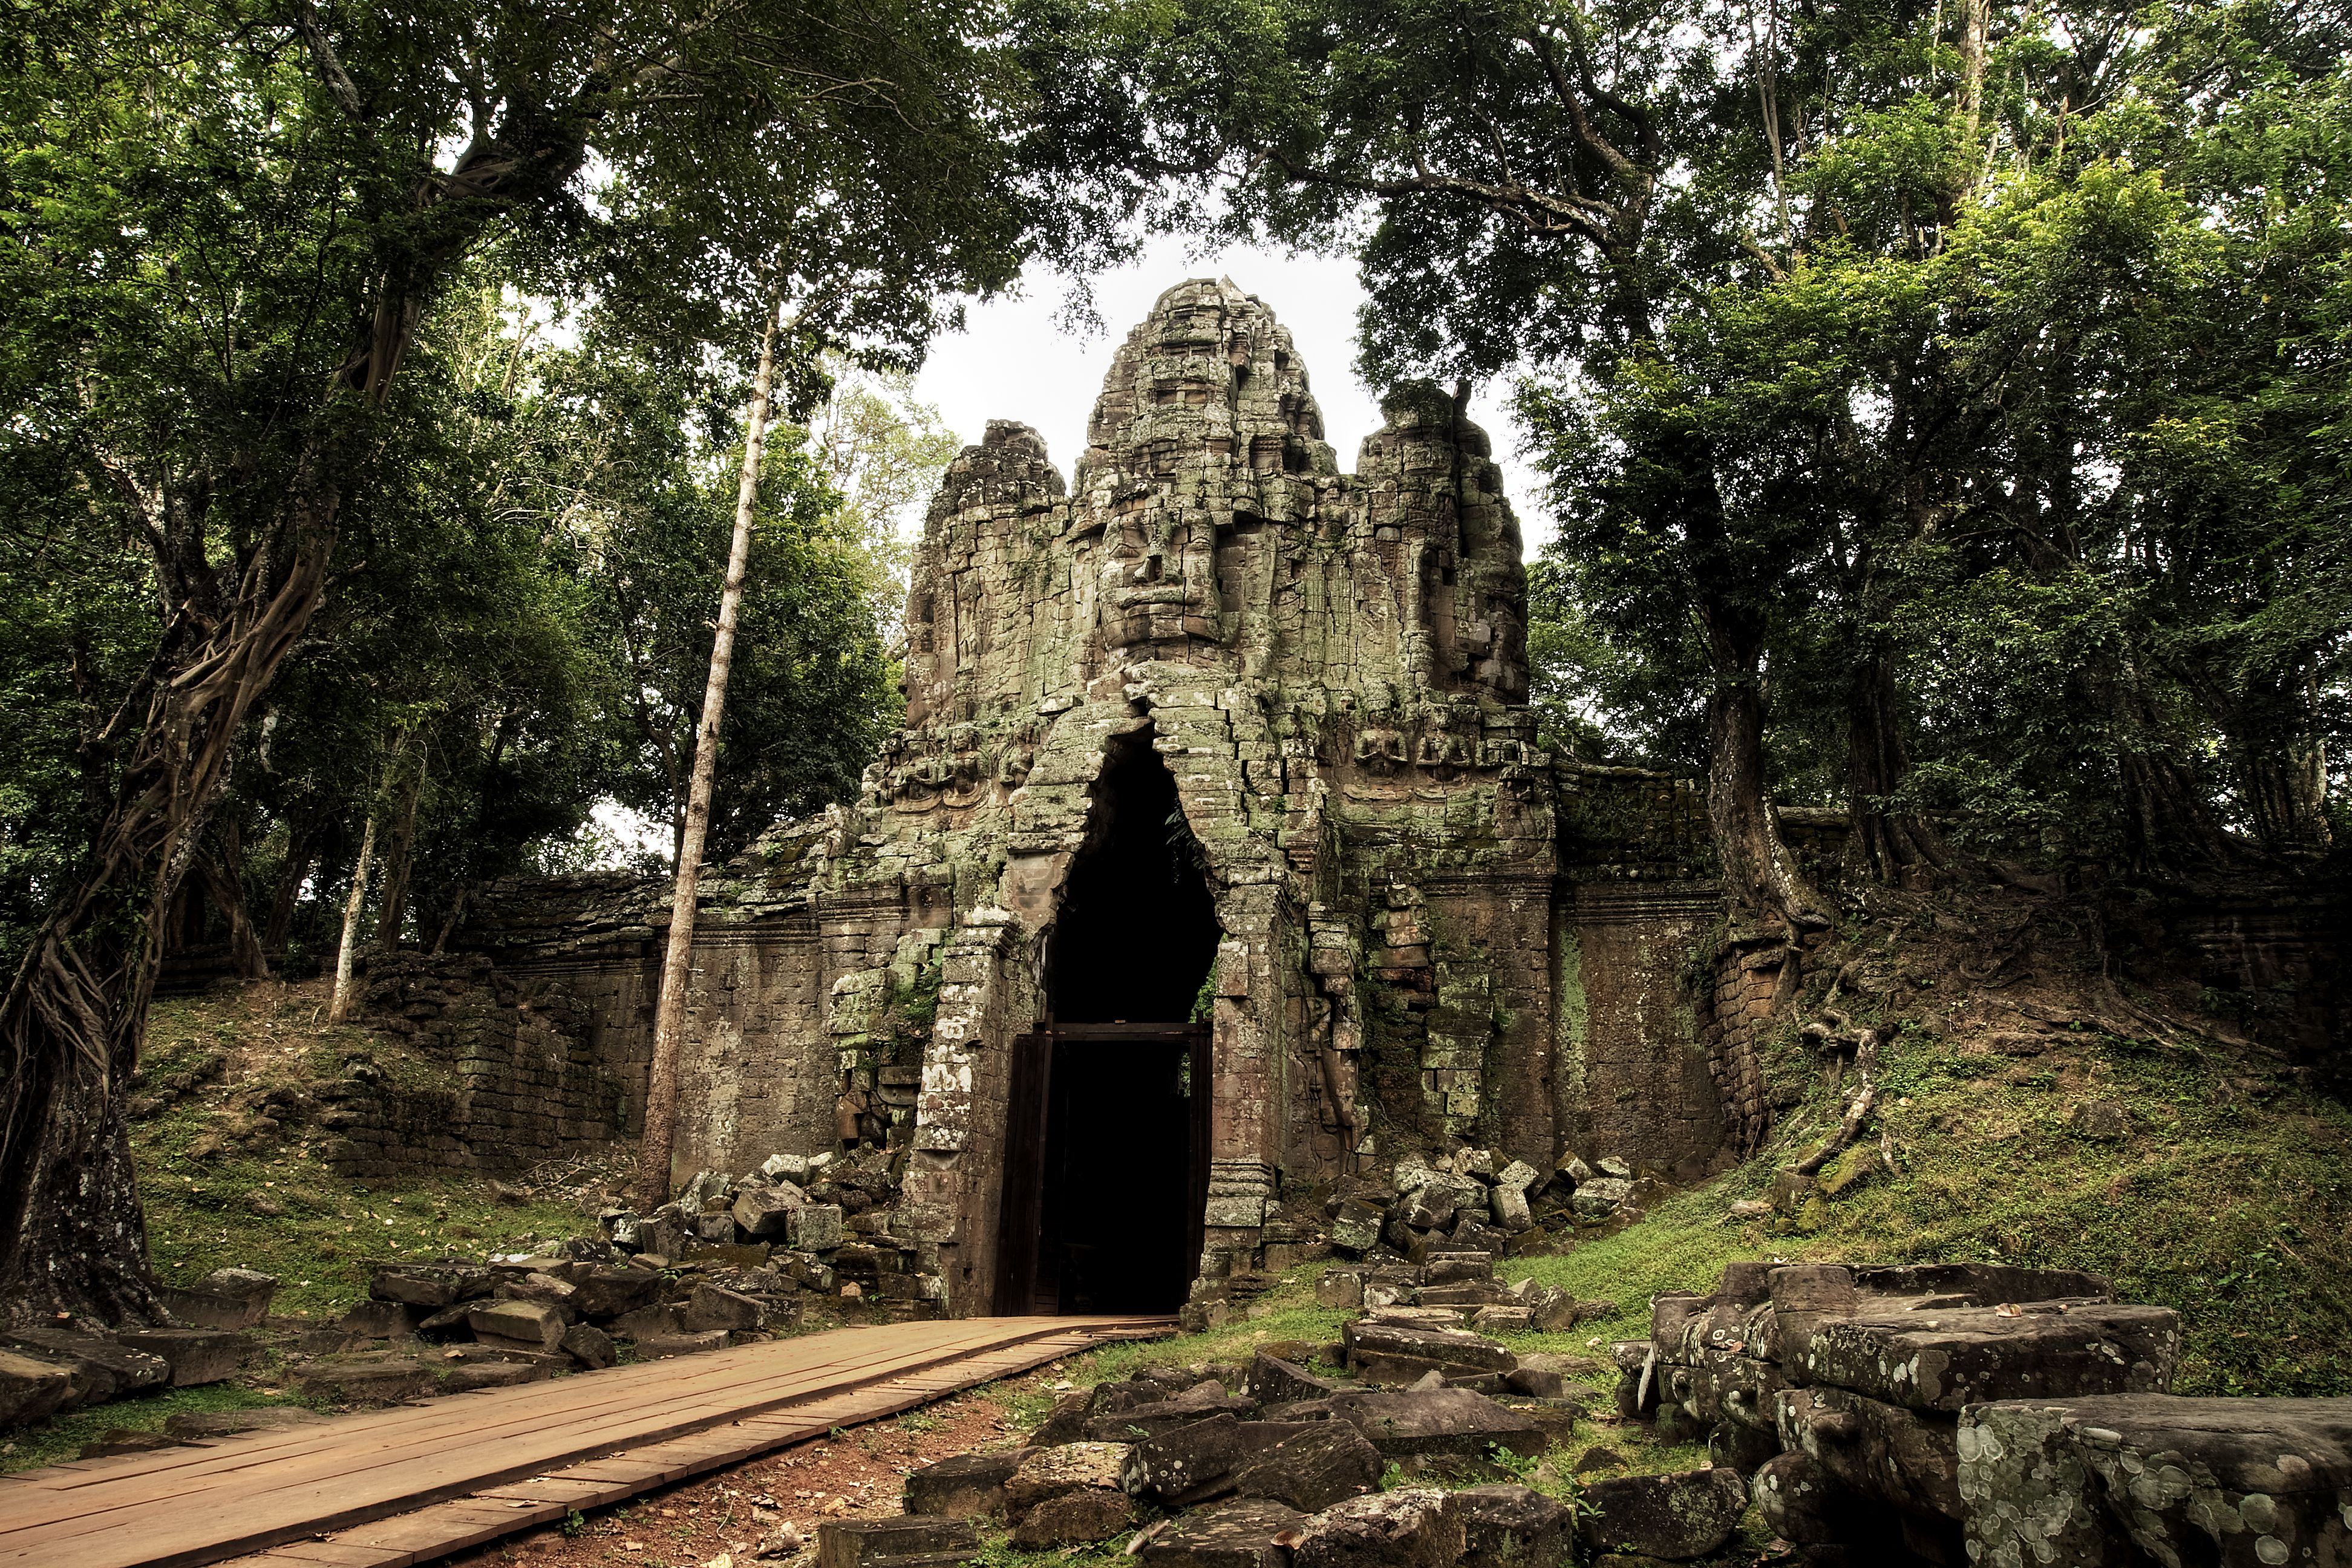 East Gate at Angkor Thom